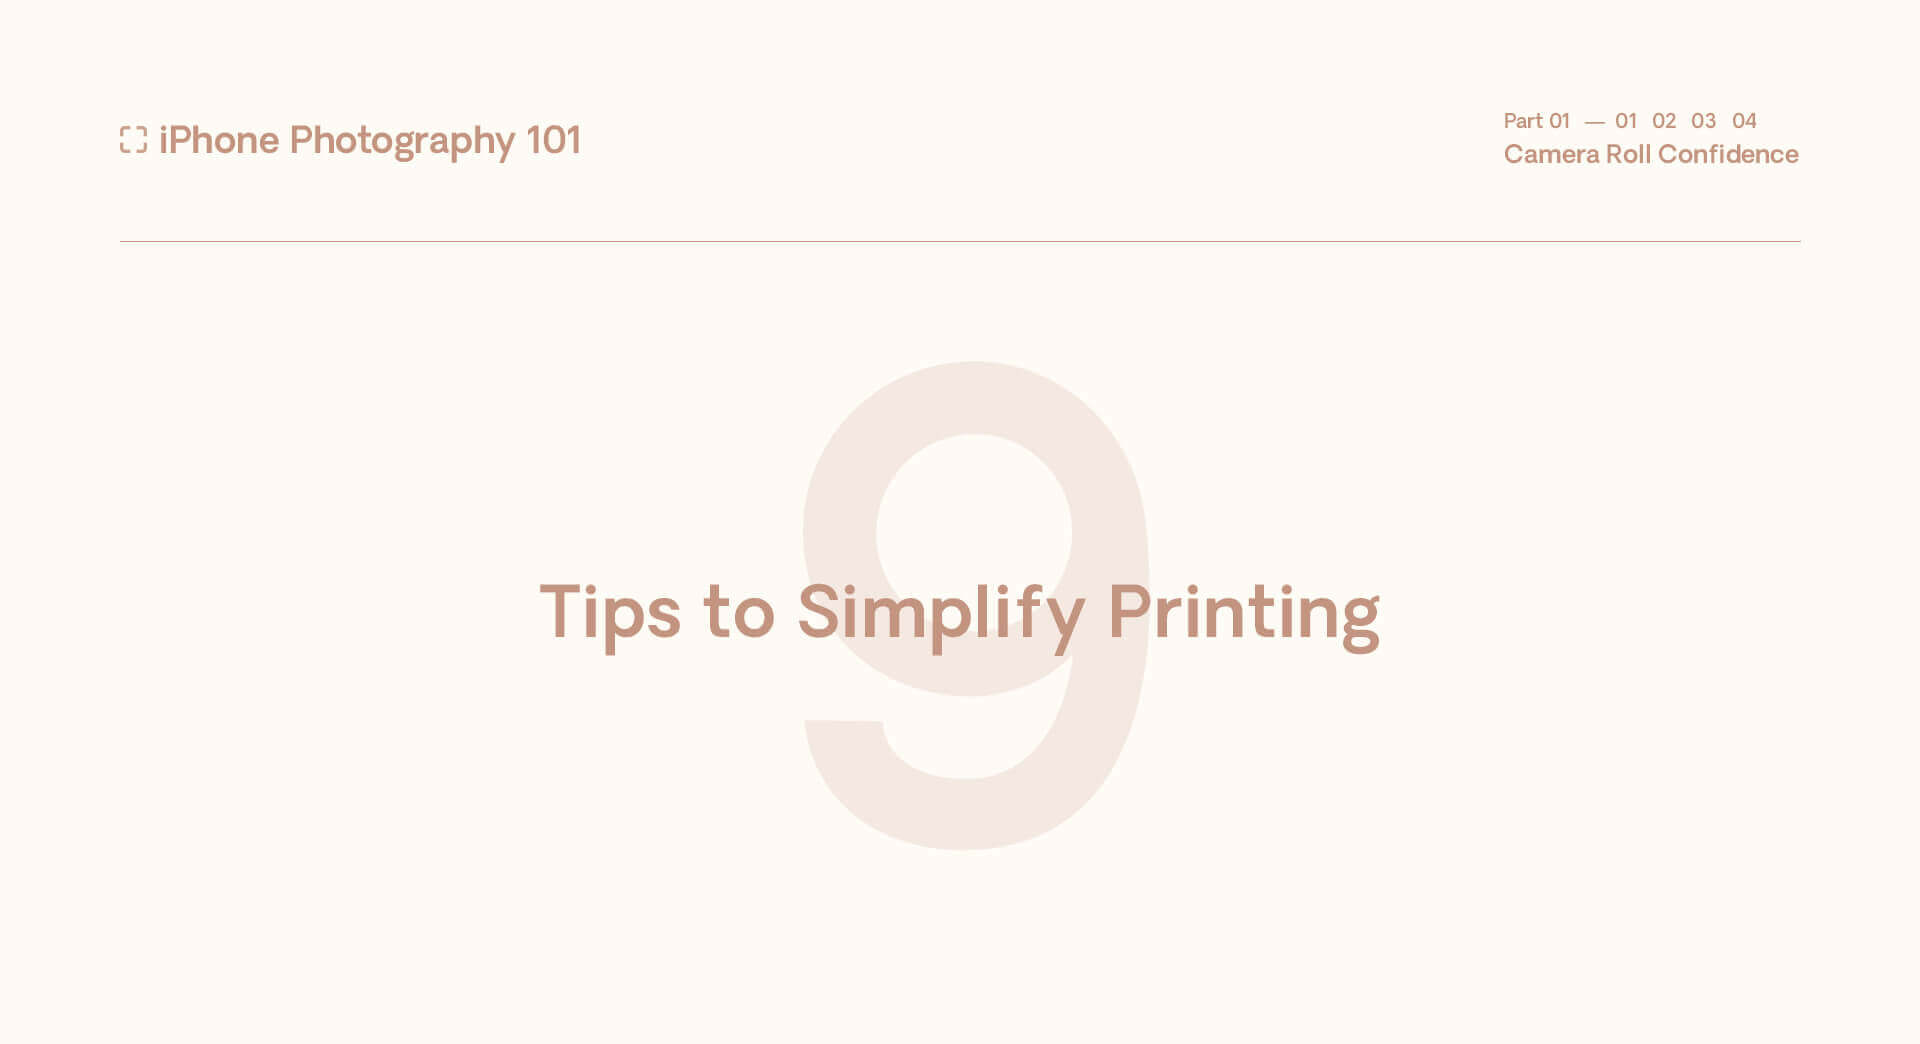 9 Tips to Simplify Printing